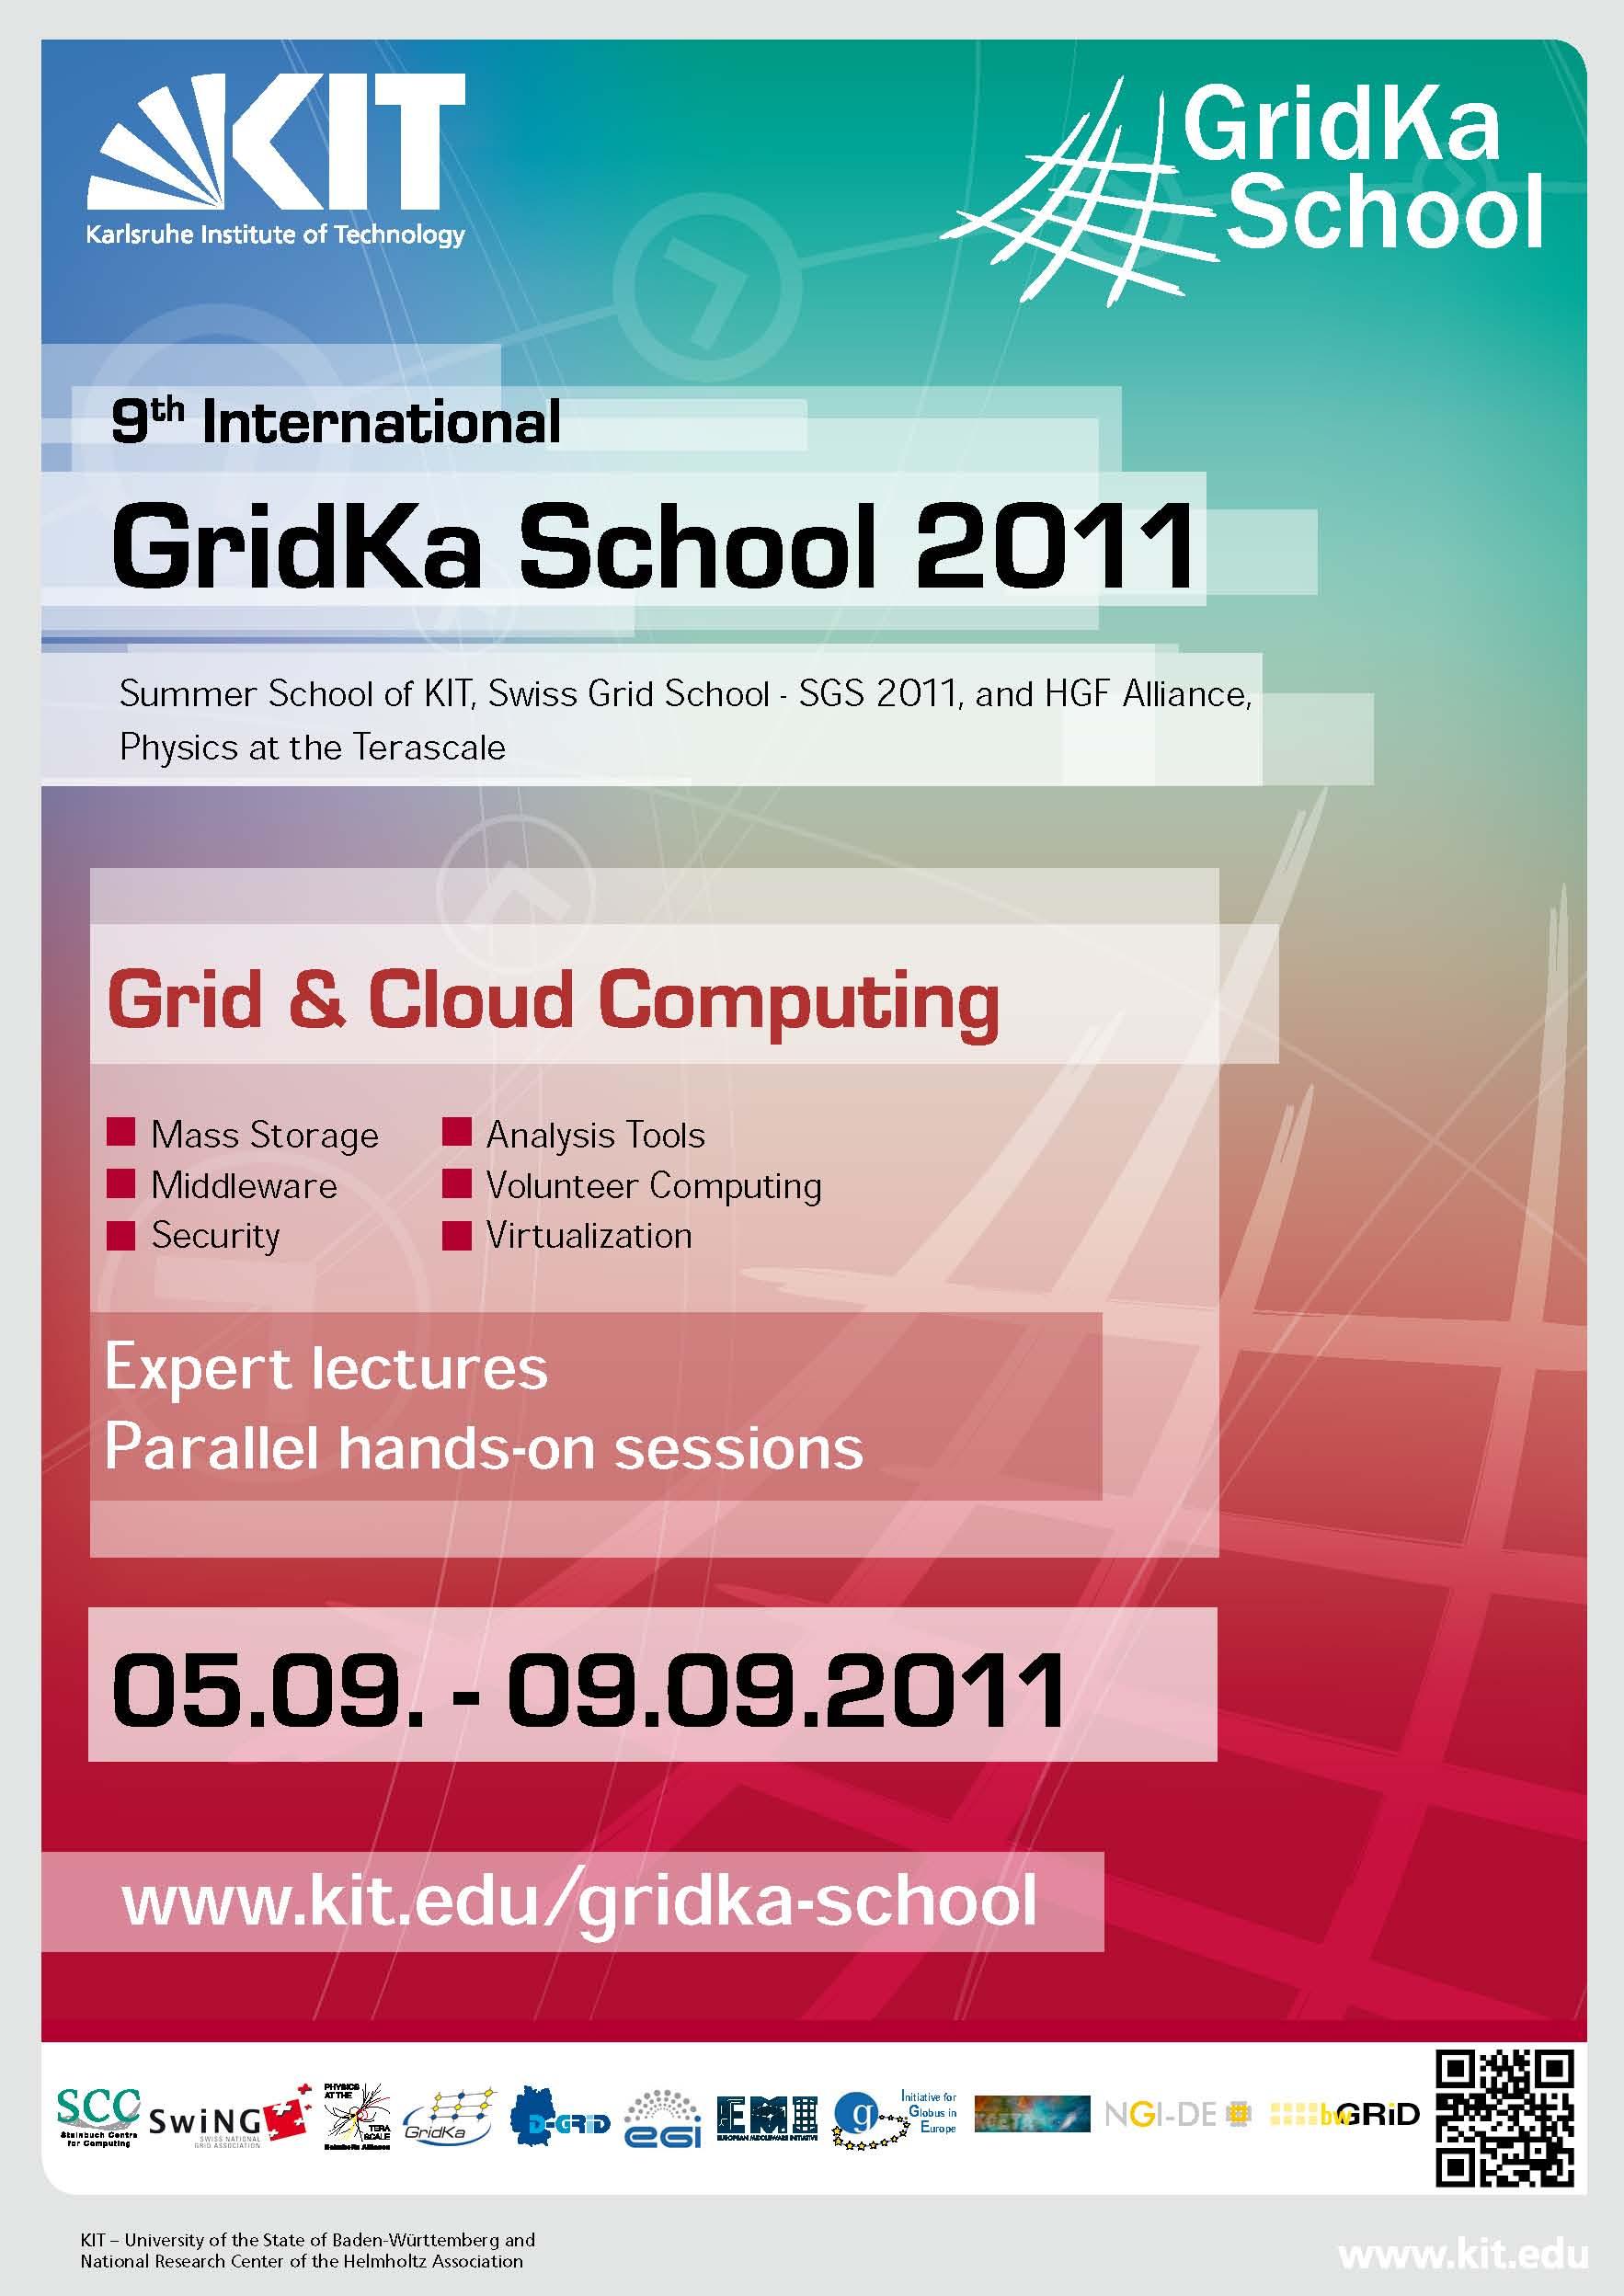 GridKa School 2011 co-organized by SwiNG